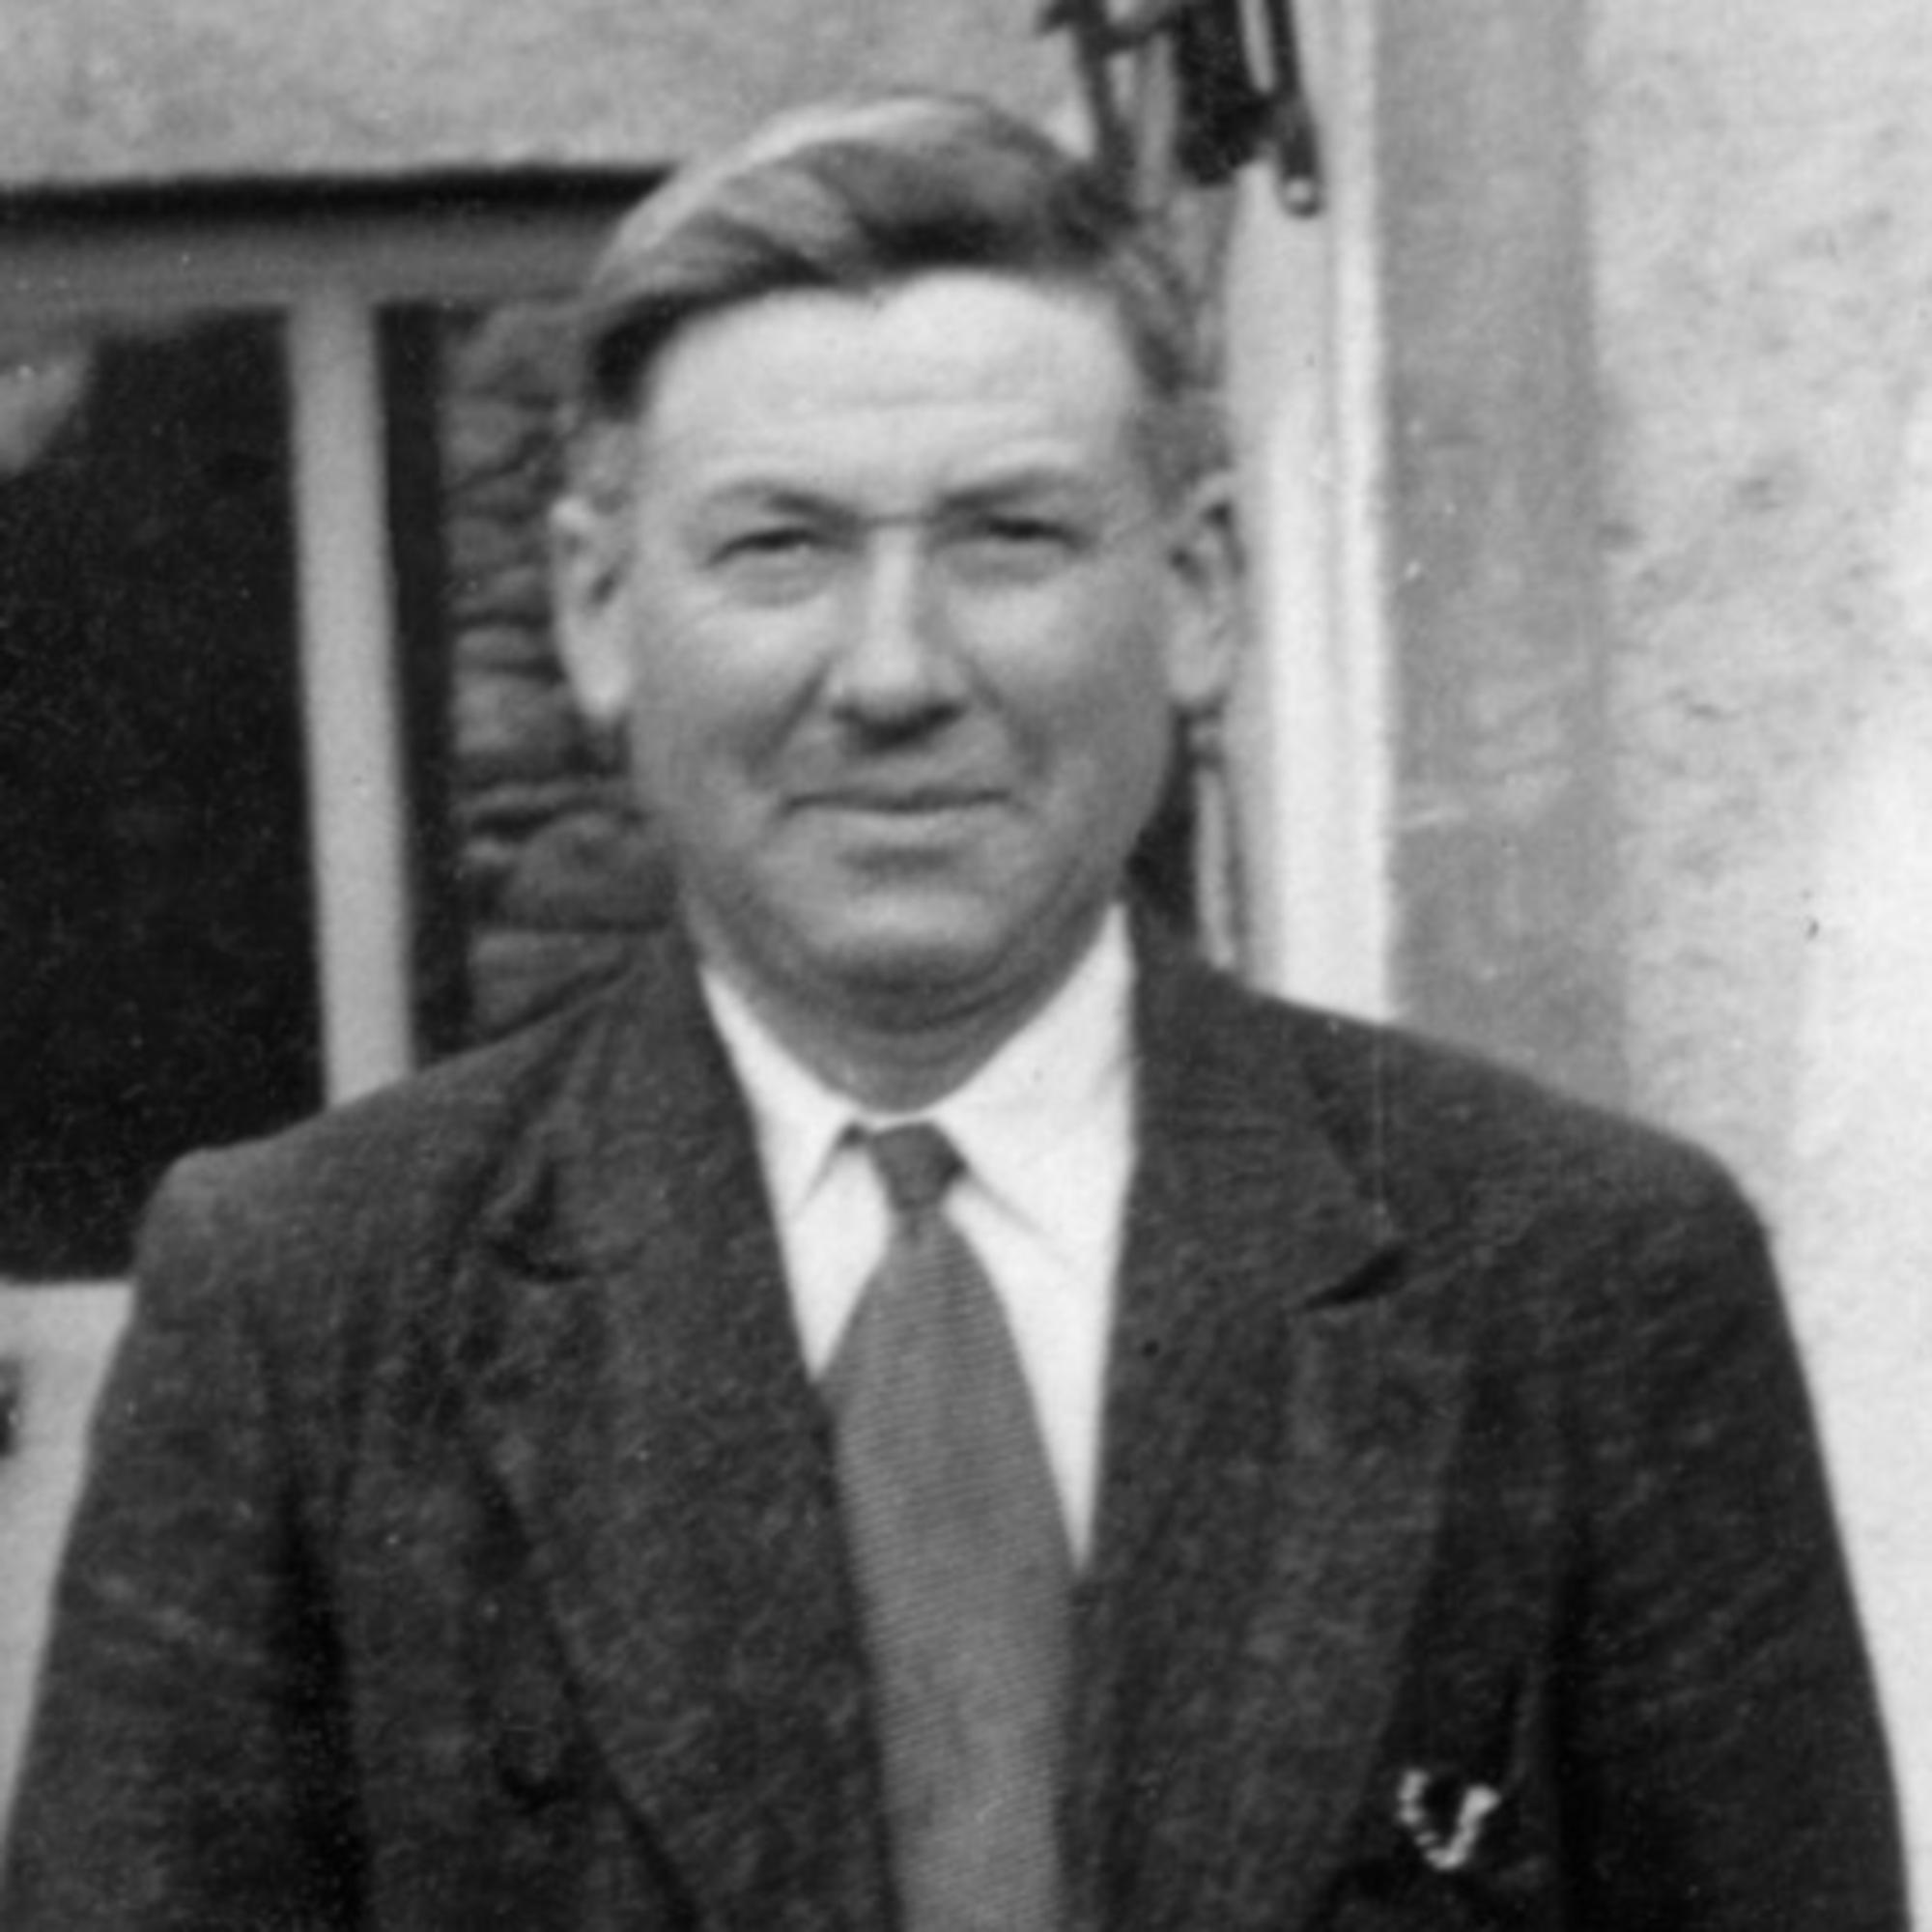 Jean David portrait